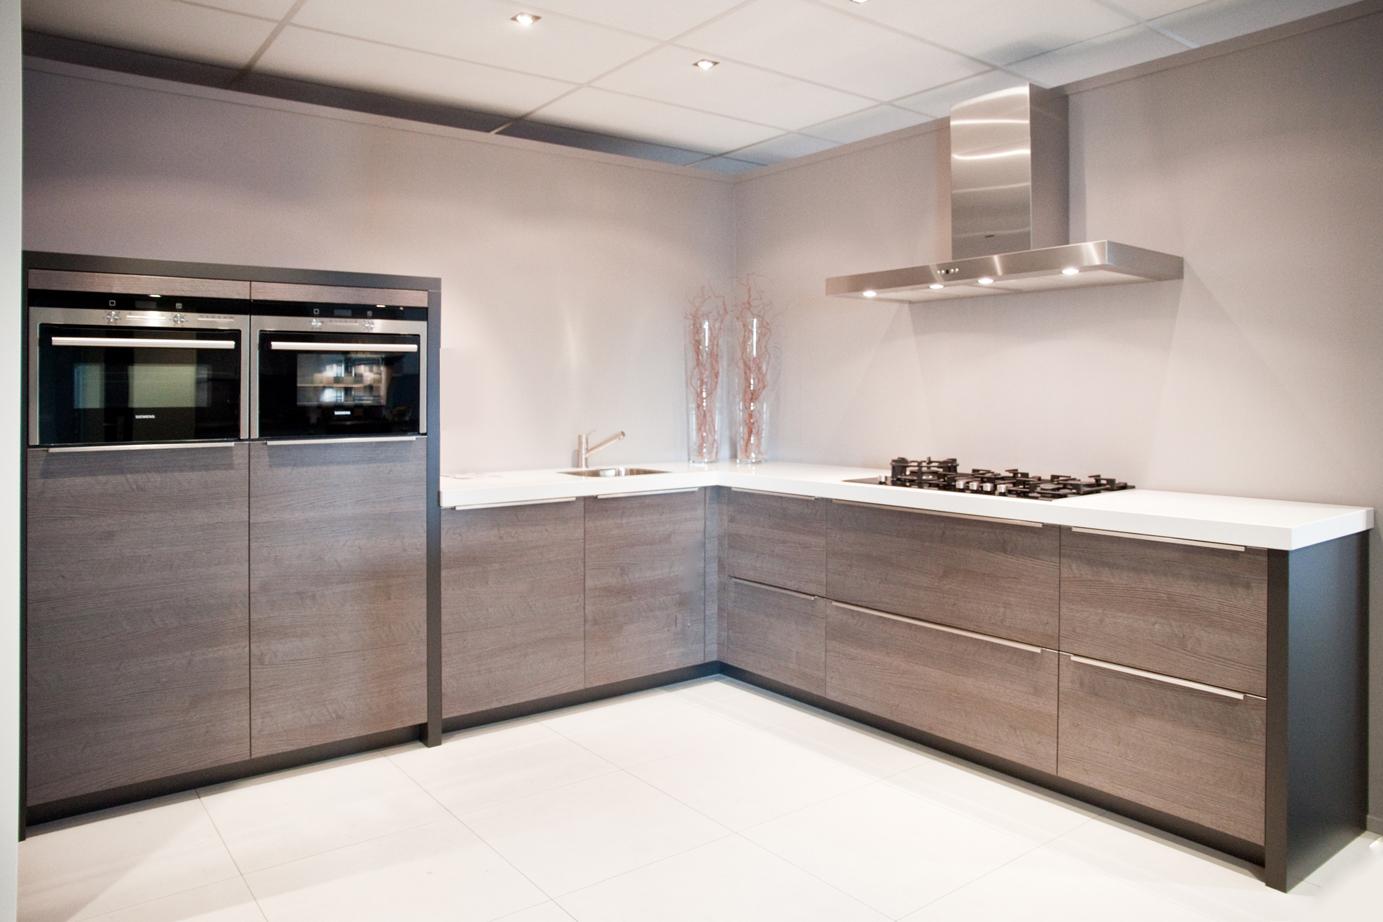 Verlichting Keuken Zonder Bovenkasten : Design keuken. Mooi strak, zonder bovenkastjes. – DB Keukens